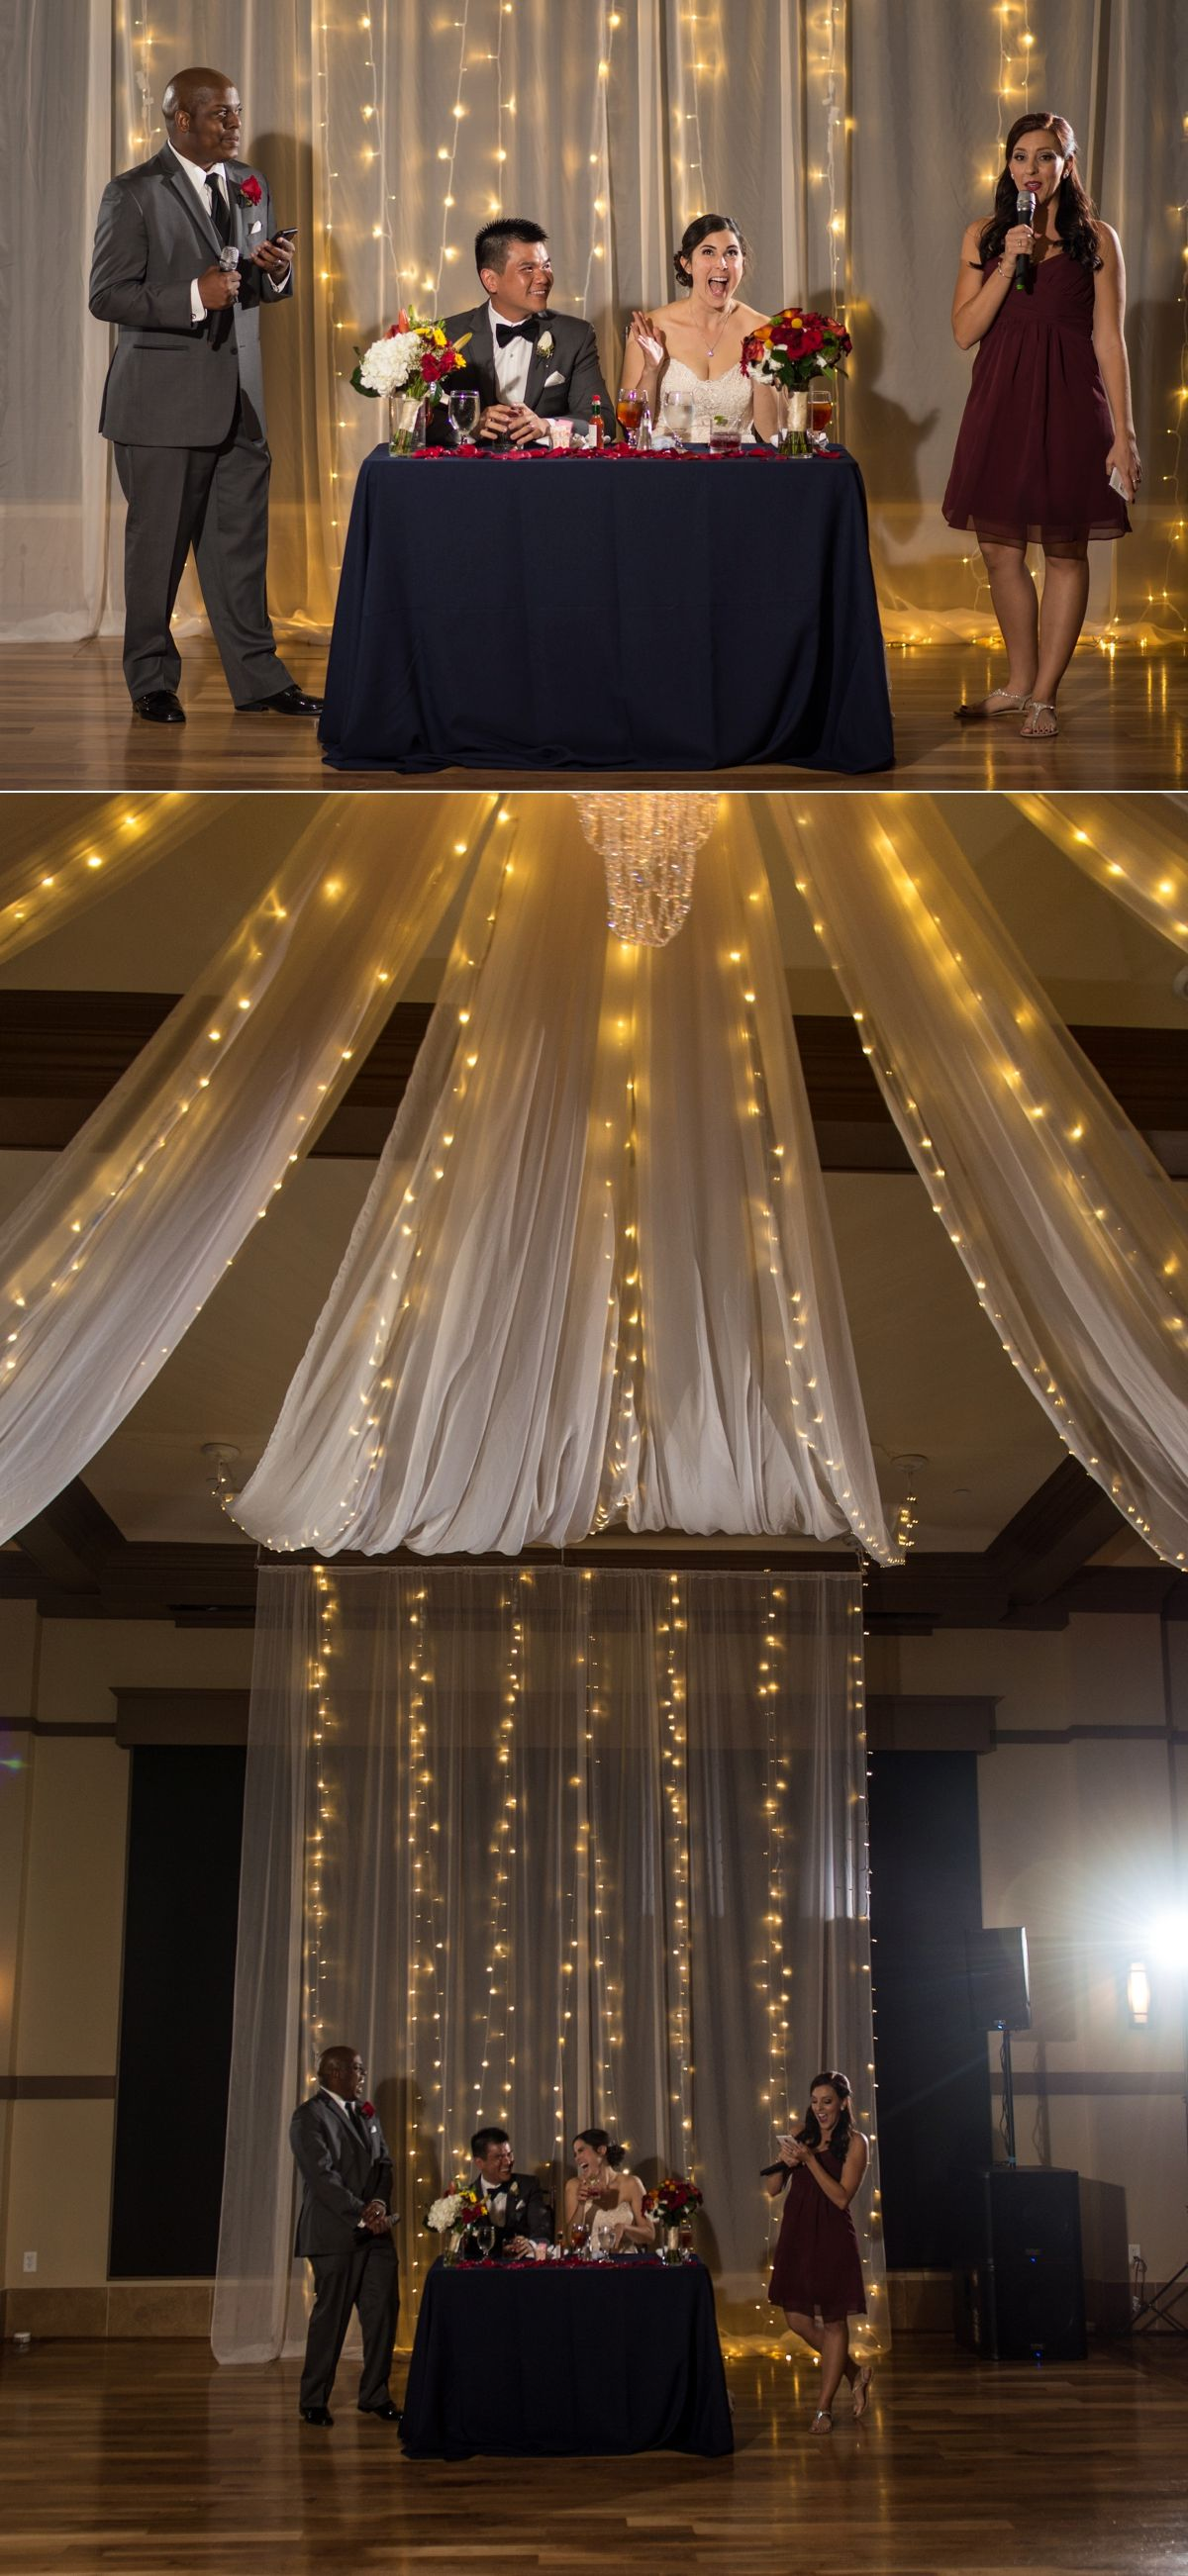 Noah S Event Venue Weddings Beautiful Reception Setup With Drape